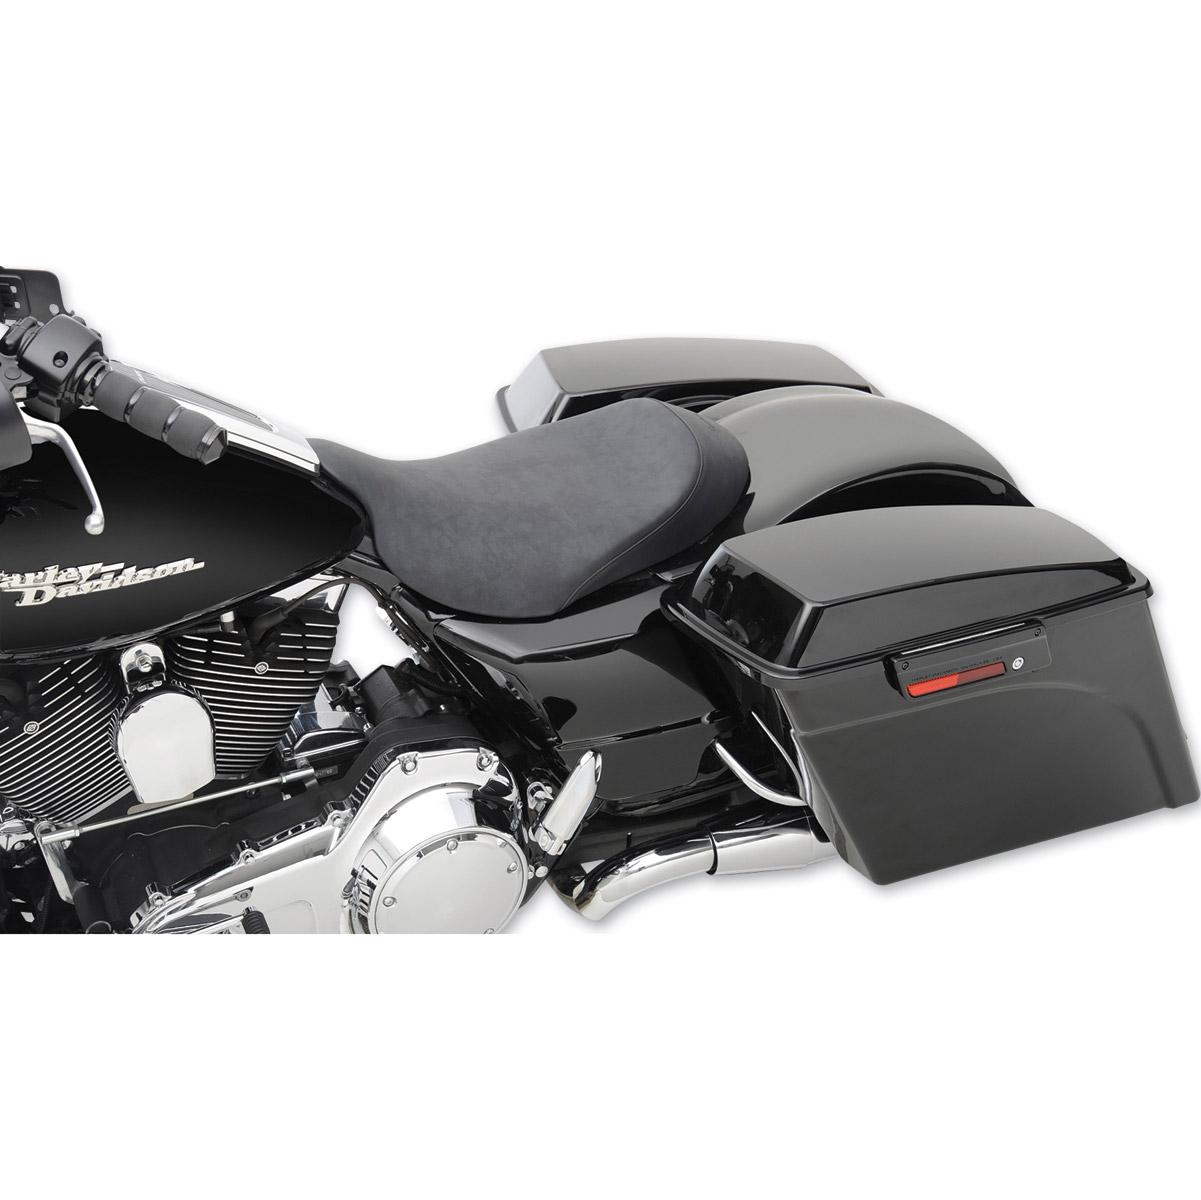 Saddlemen Renegade S3 Super Slammed WP-Suede Cover Solo Seat